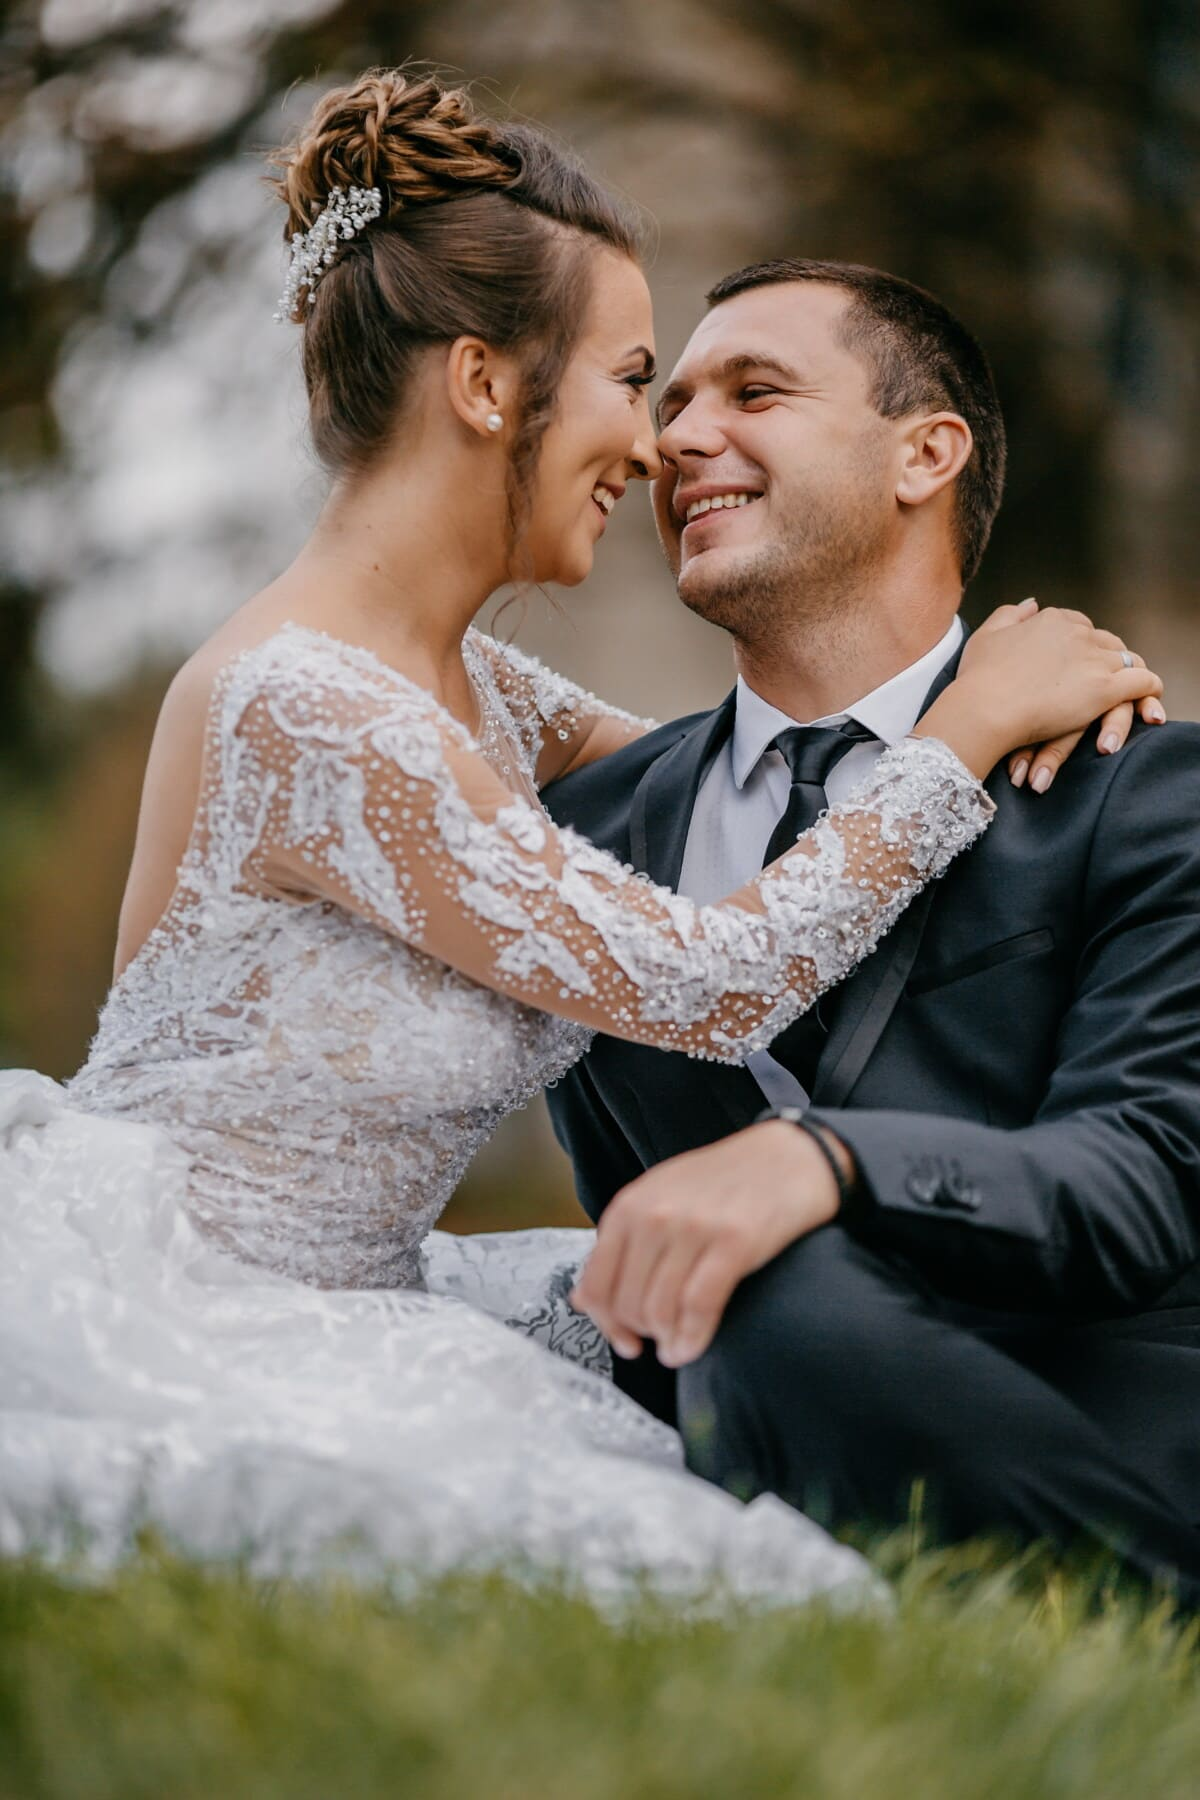 umarmt, Jungvermählten, Kuss, Rasen, sitzen, Liebe, Bräutigam, Mann, Braut, paar